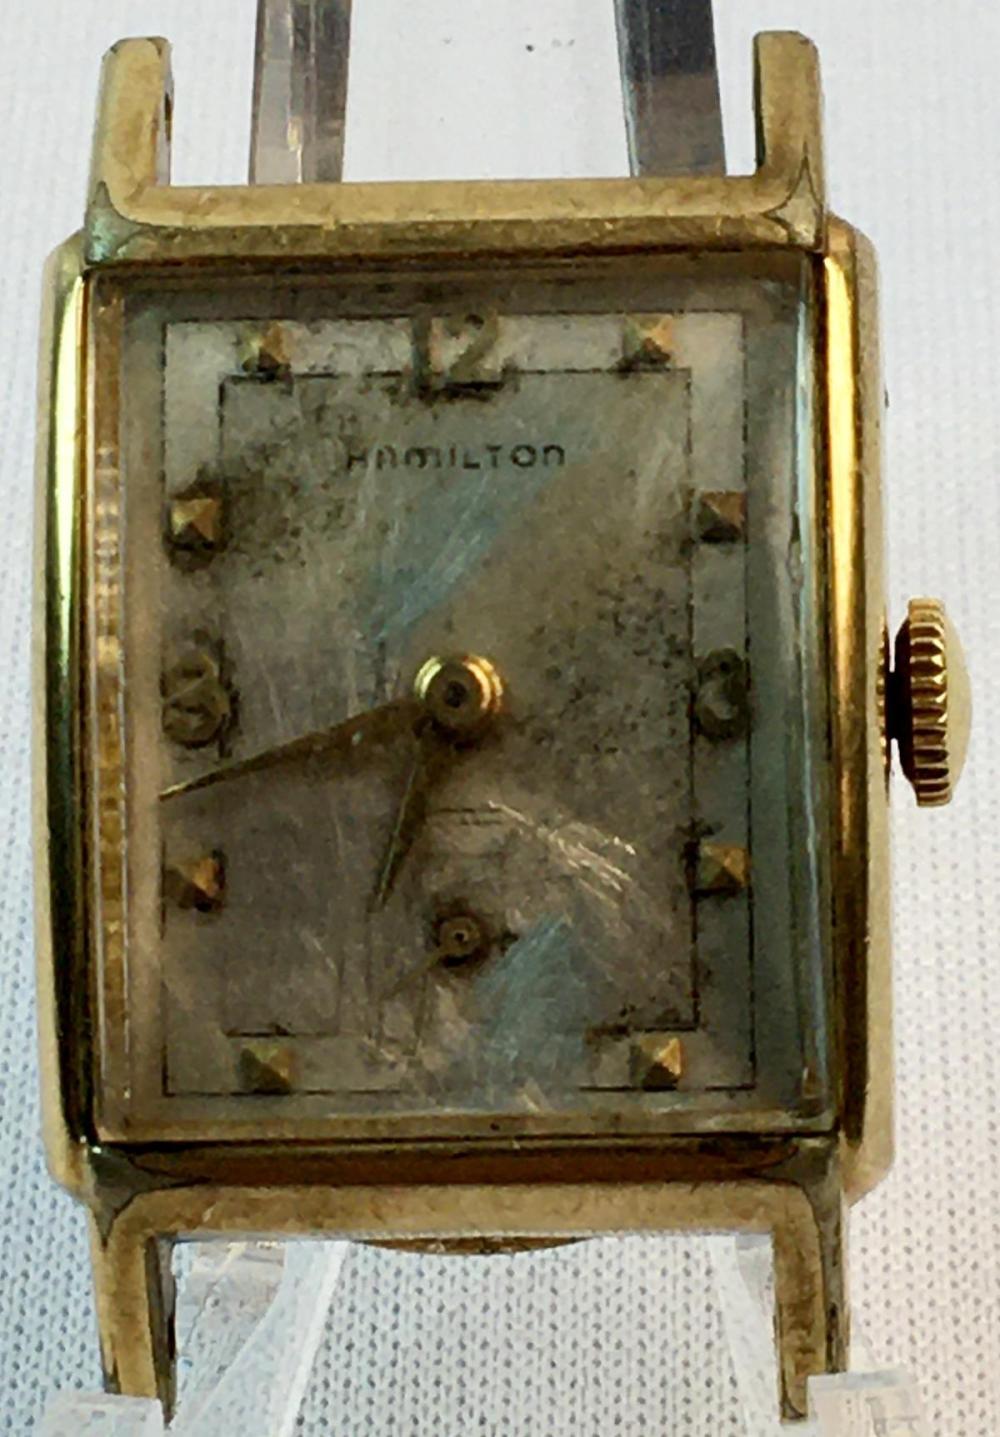 Vintage 1952 Hamilton 10K GF 19 Jewel Watch Face & Case